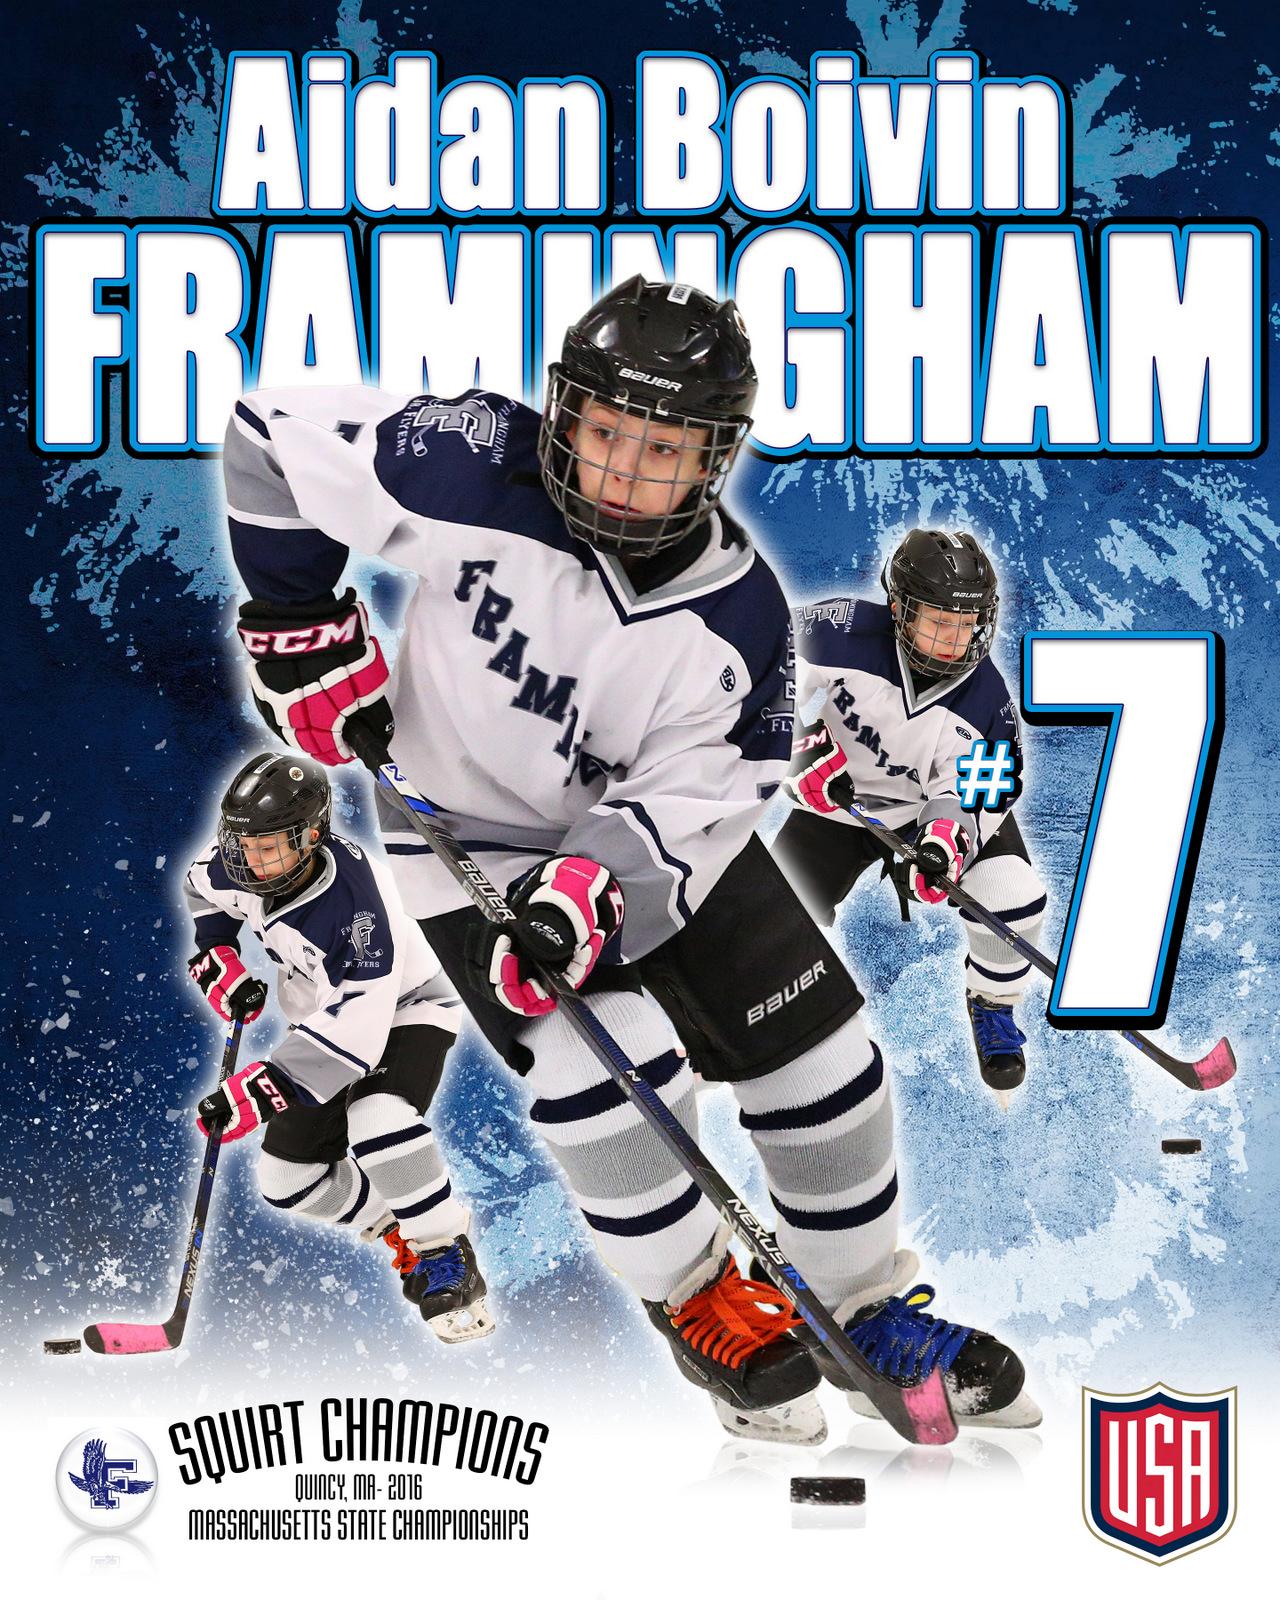 SilverPeak Studios Commemorative Poster Samples Action Sports Hockey Photography (11)